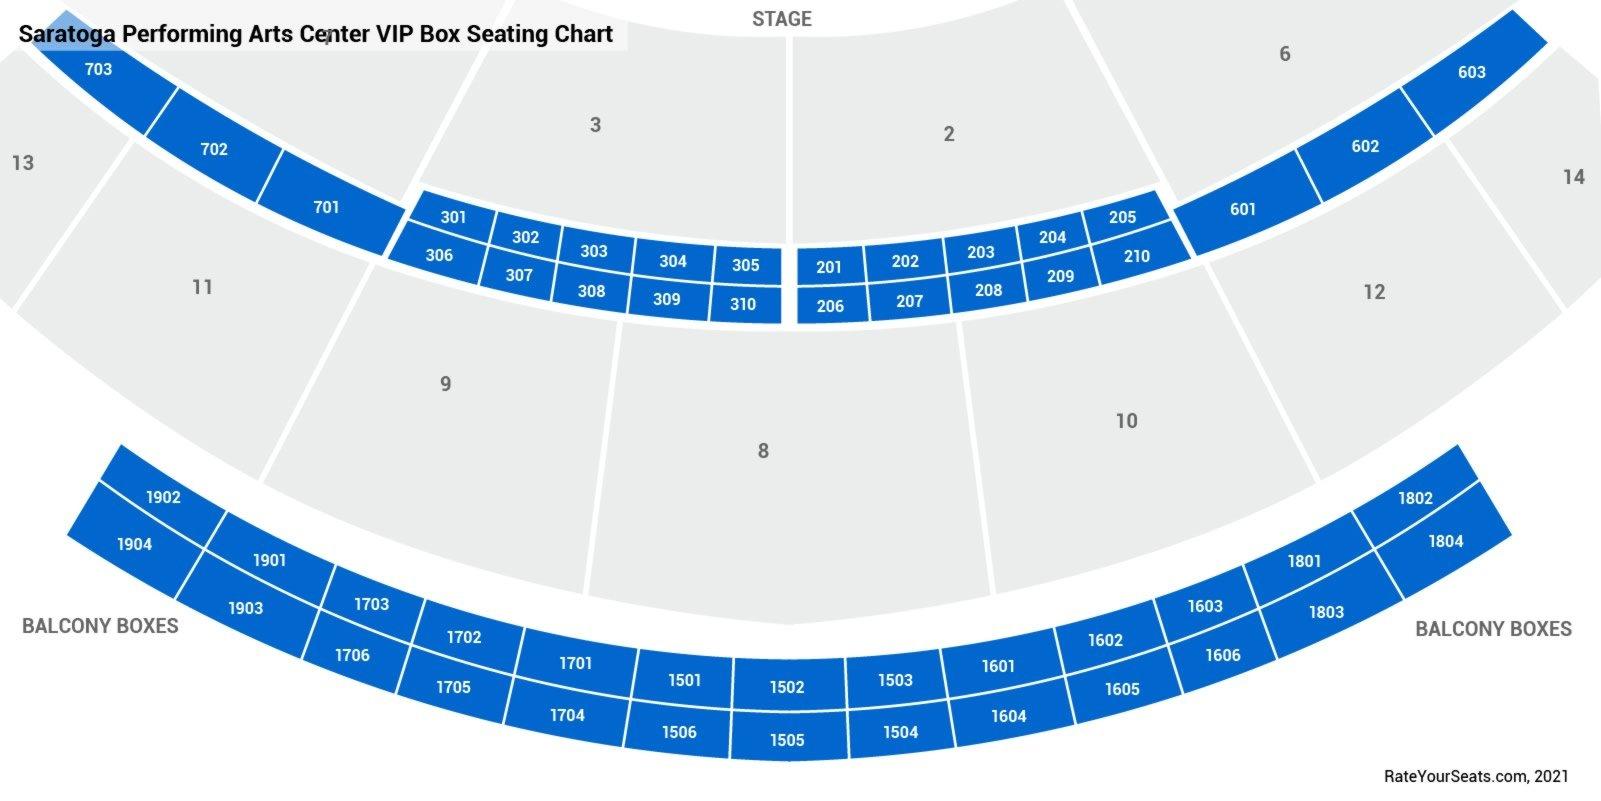 Saratoga Performing Arts Center Box Seats Rateyourseatscom